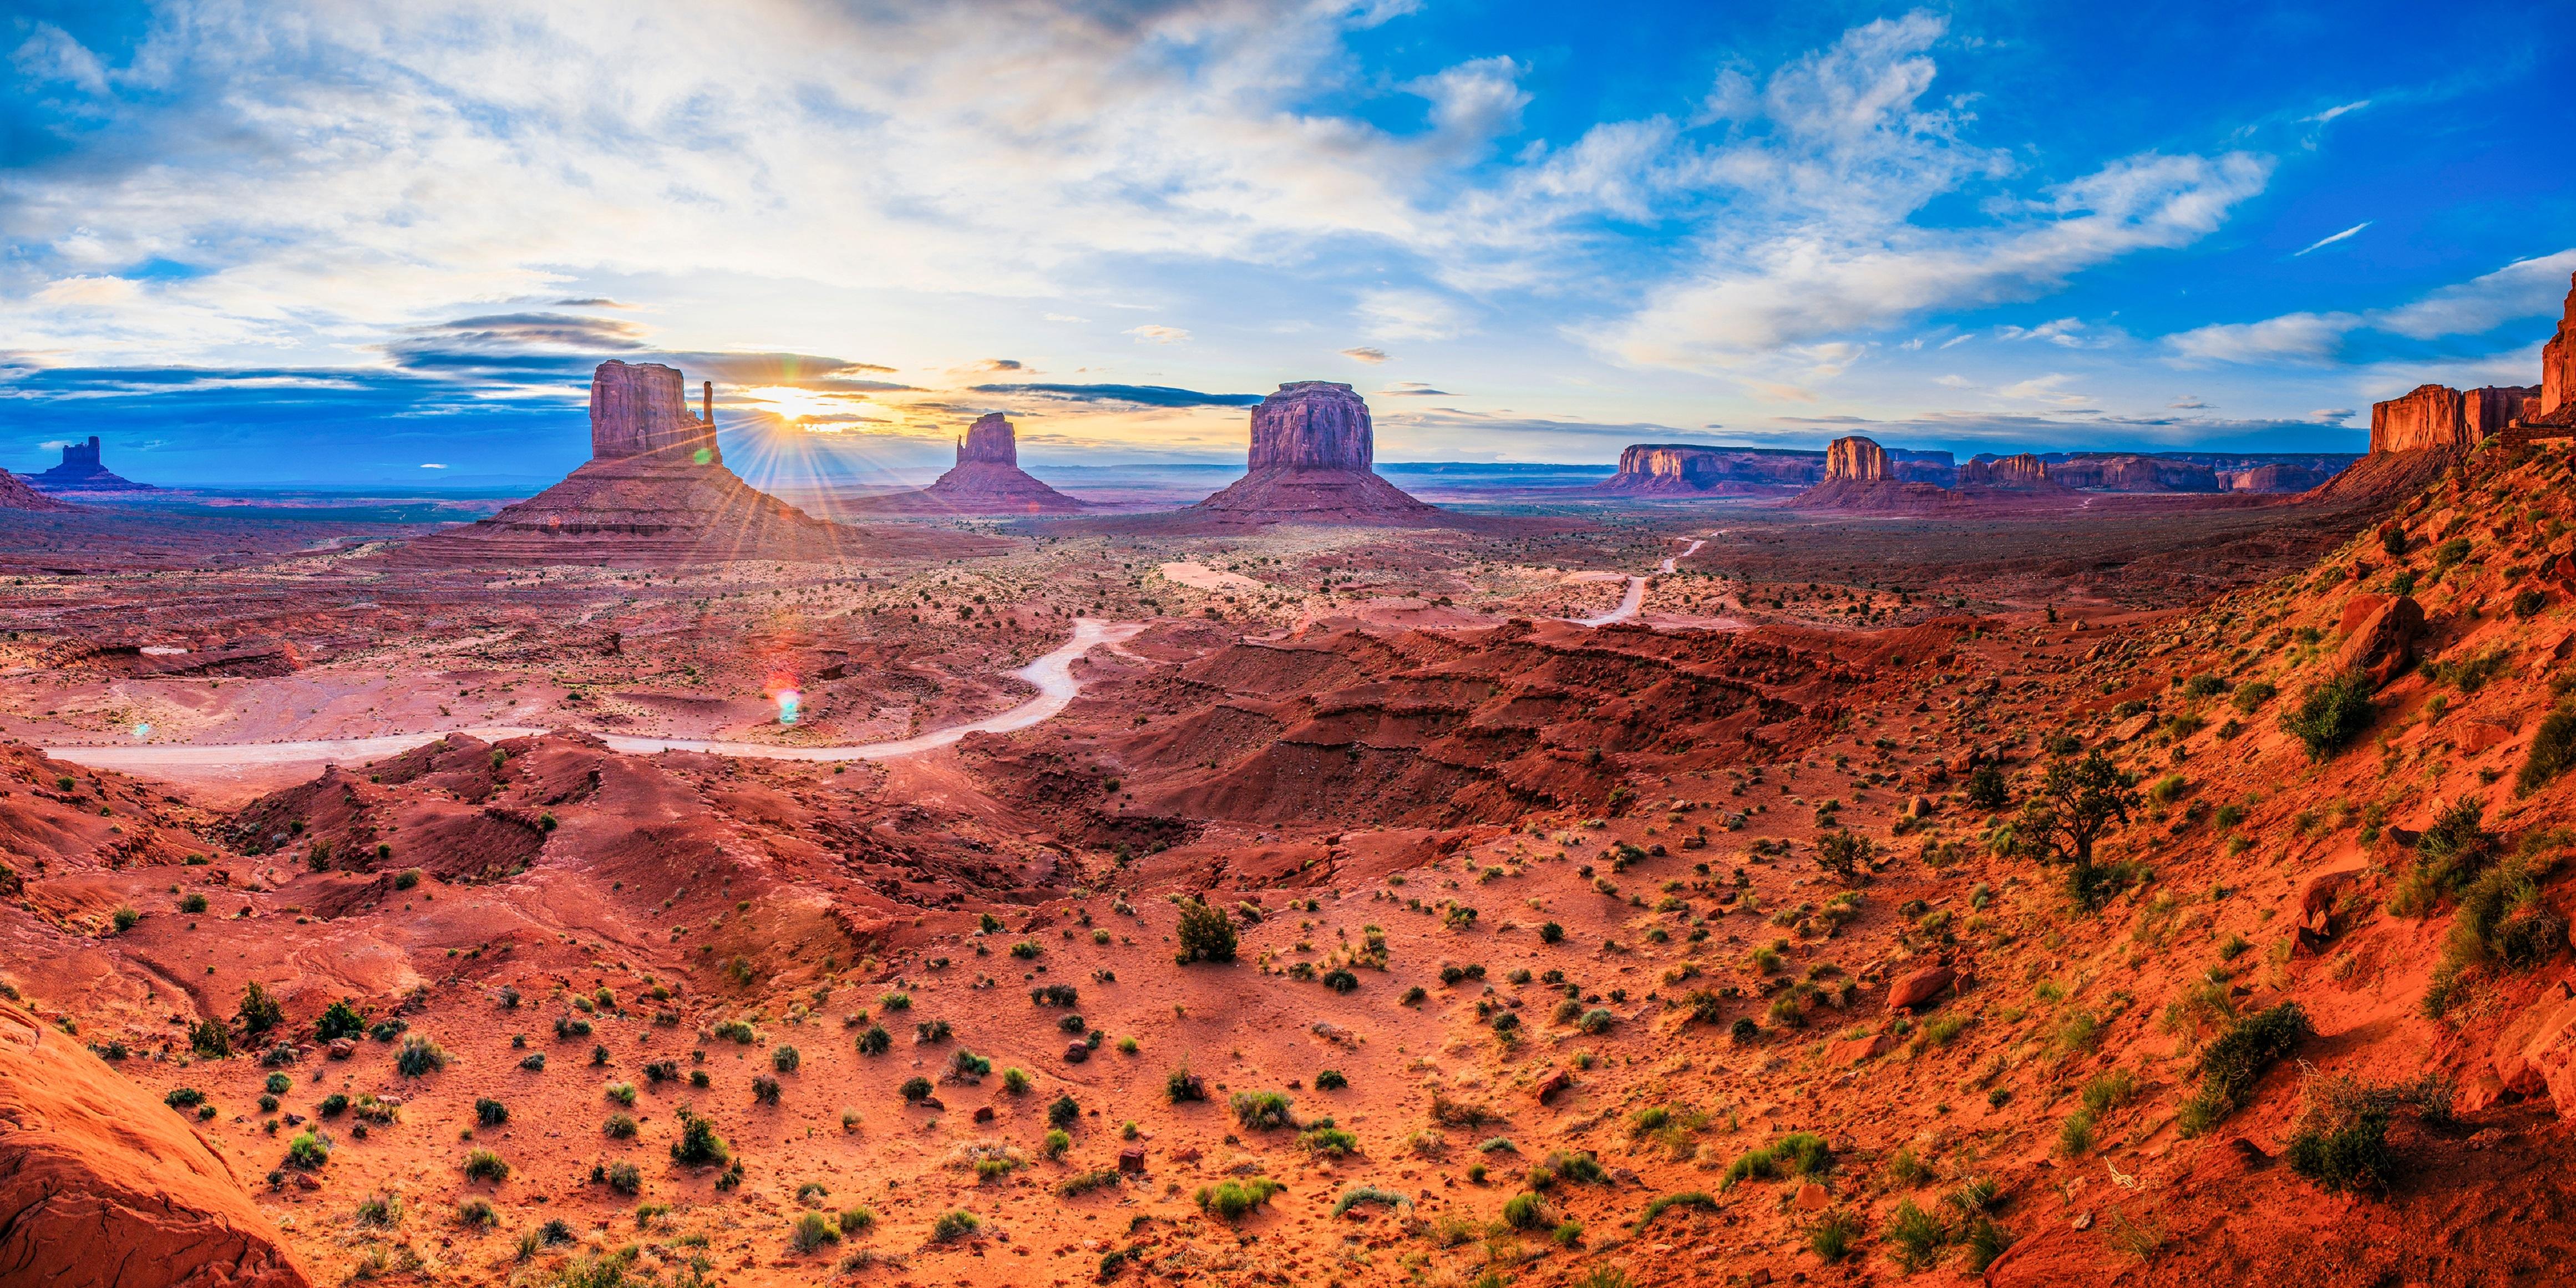 Canva - Monument Valley in Utah and Arizona, United States.jpg